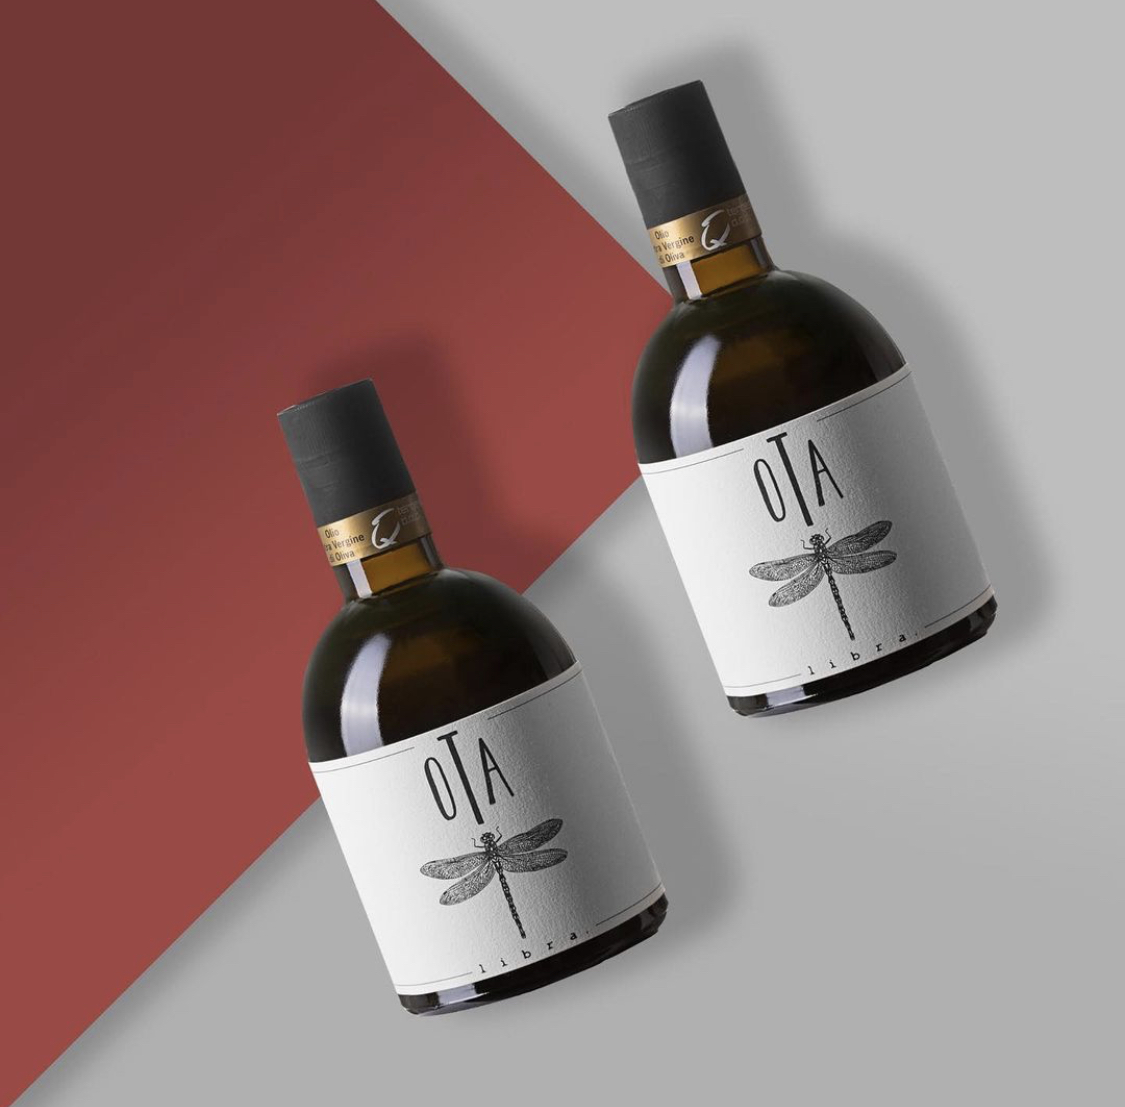 OTA Olive Oil